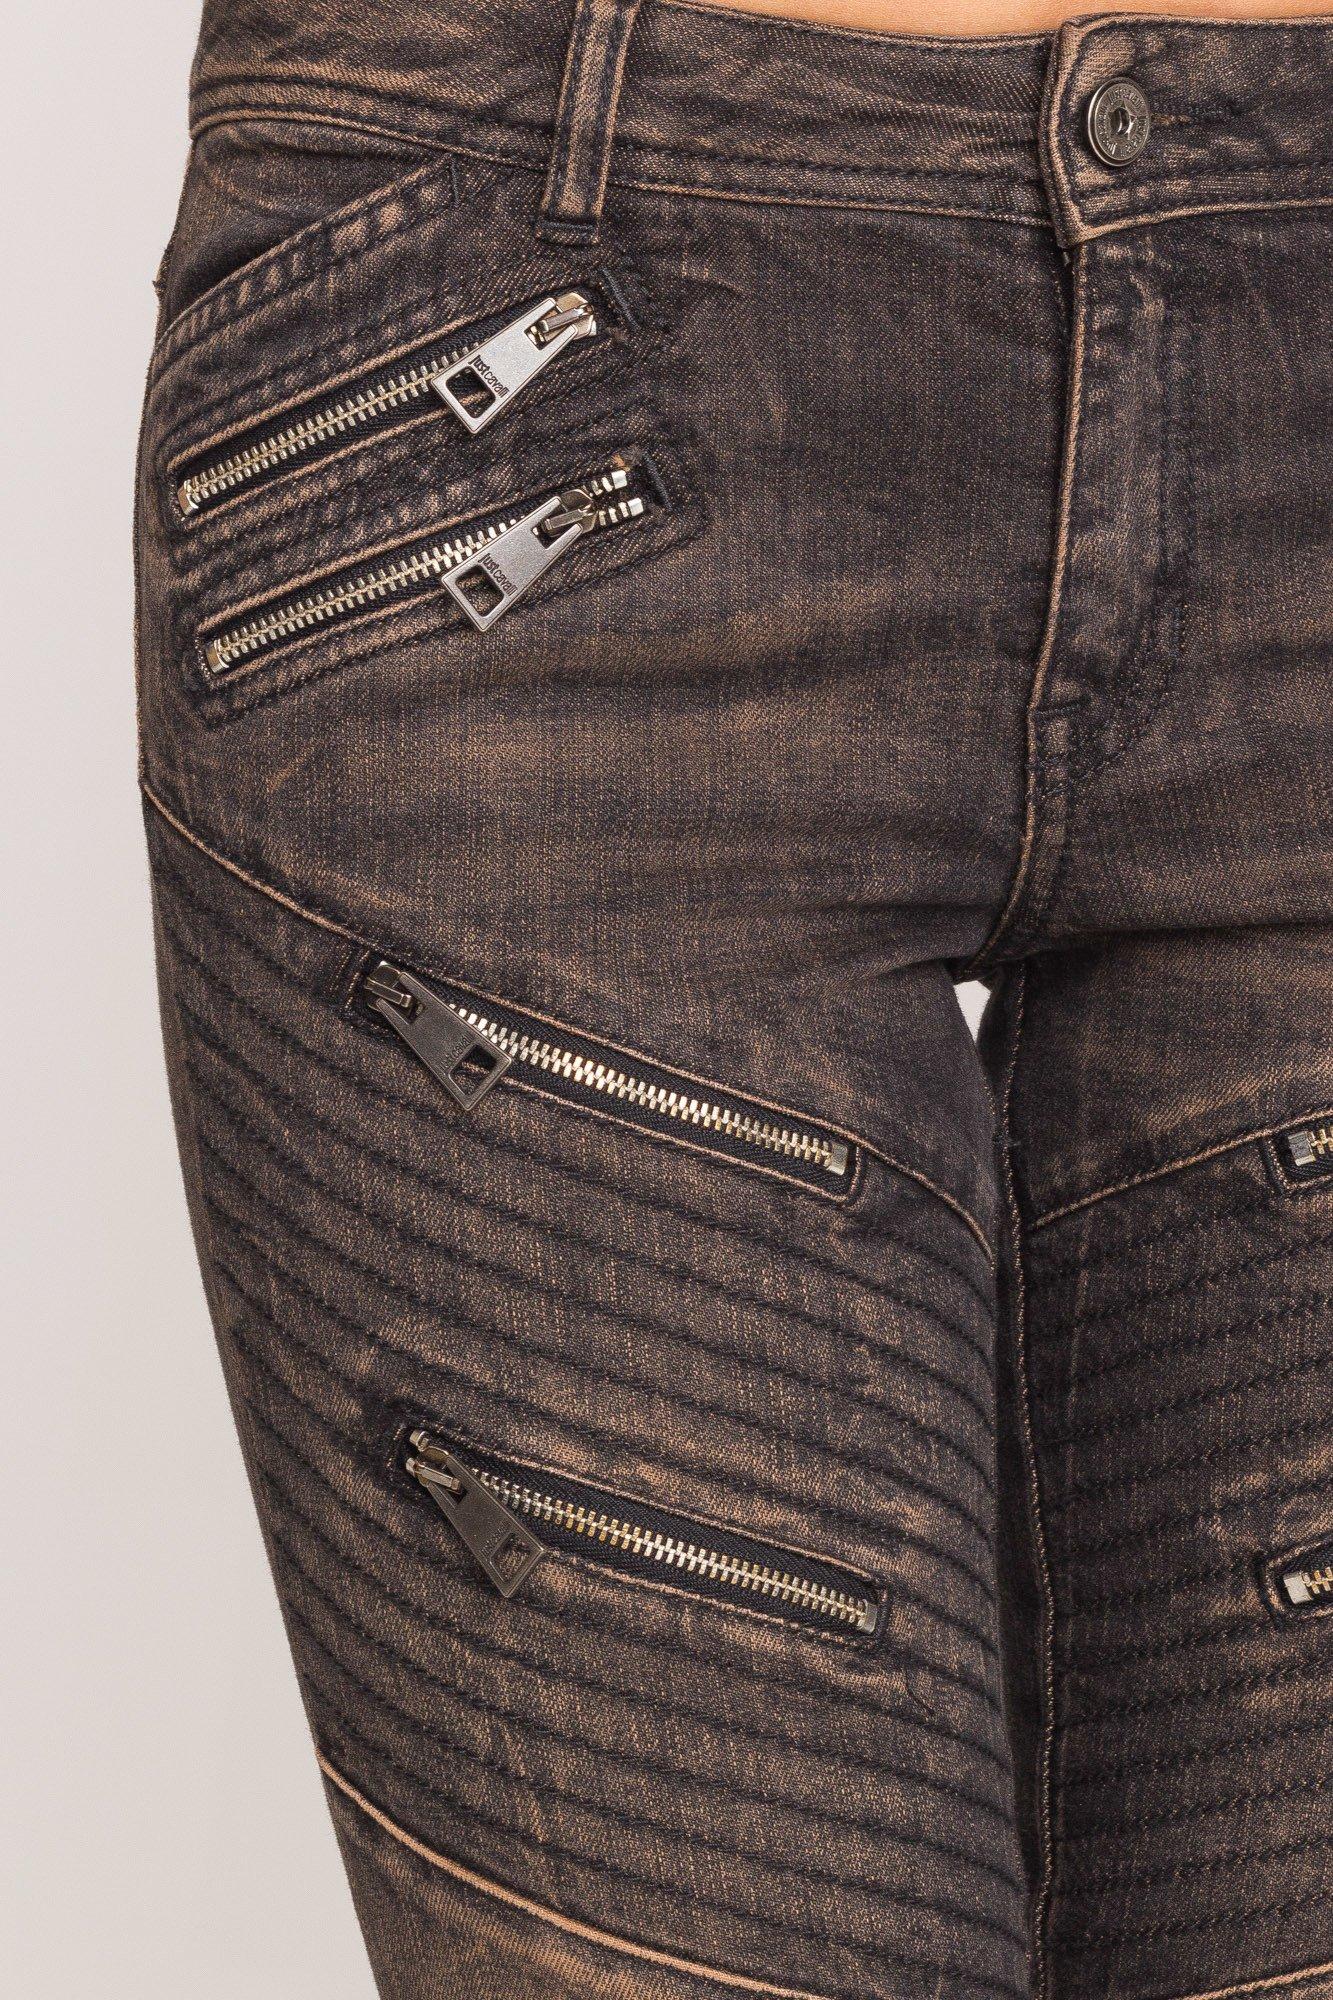 d0ee93a6 Szare jeansy Just Cavalli z zamkami